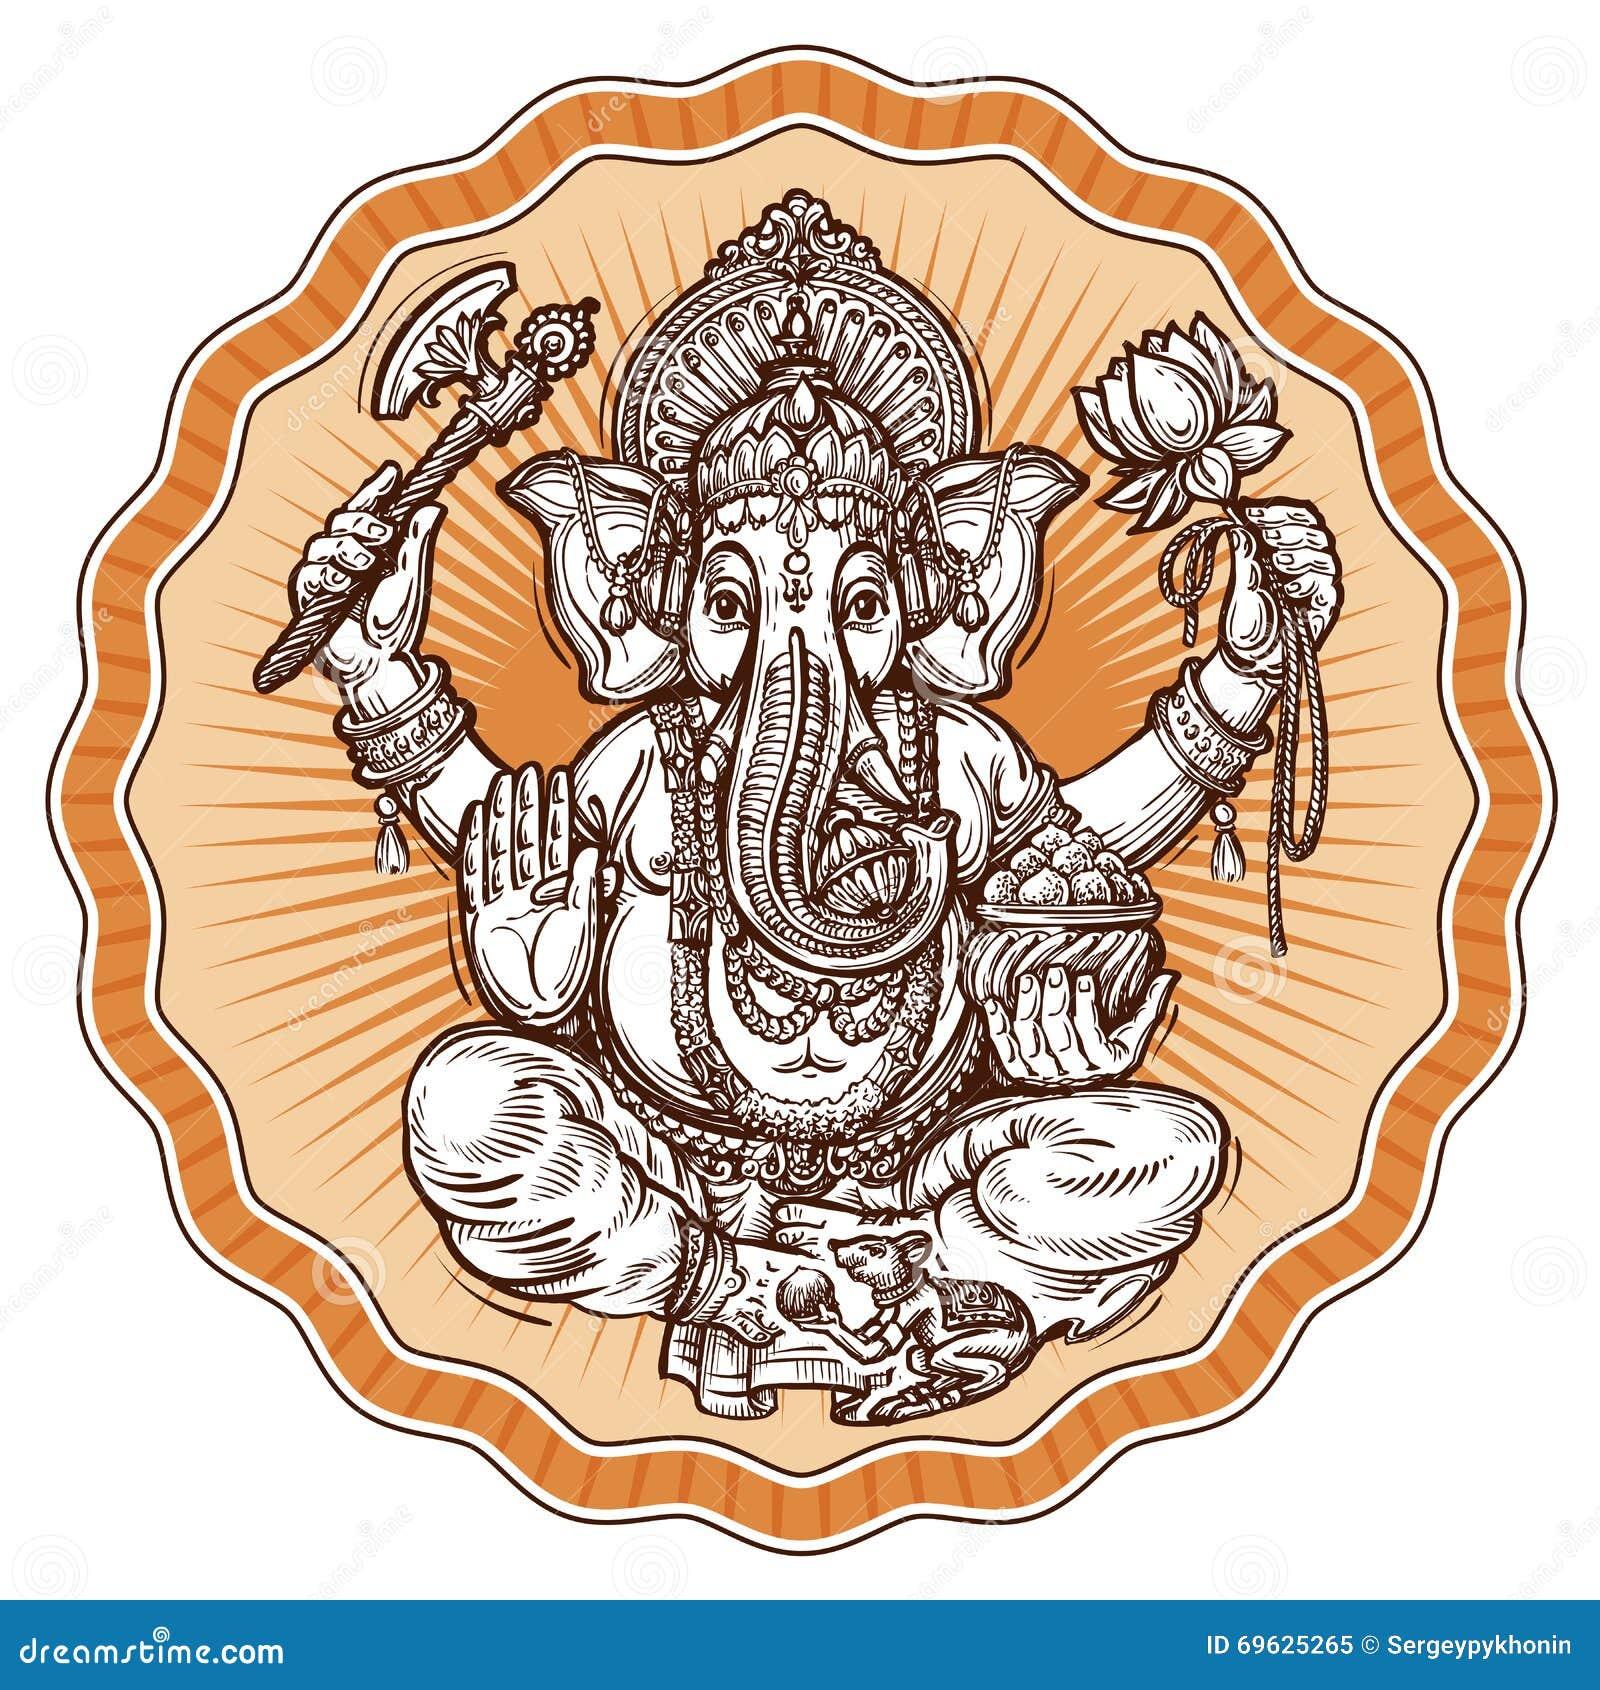 Ganesh Chaturthi. Hand-drawn Sketch Religious Symbol Of